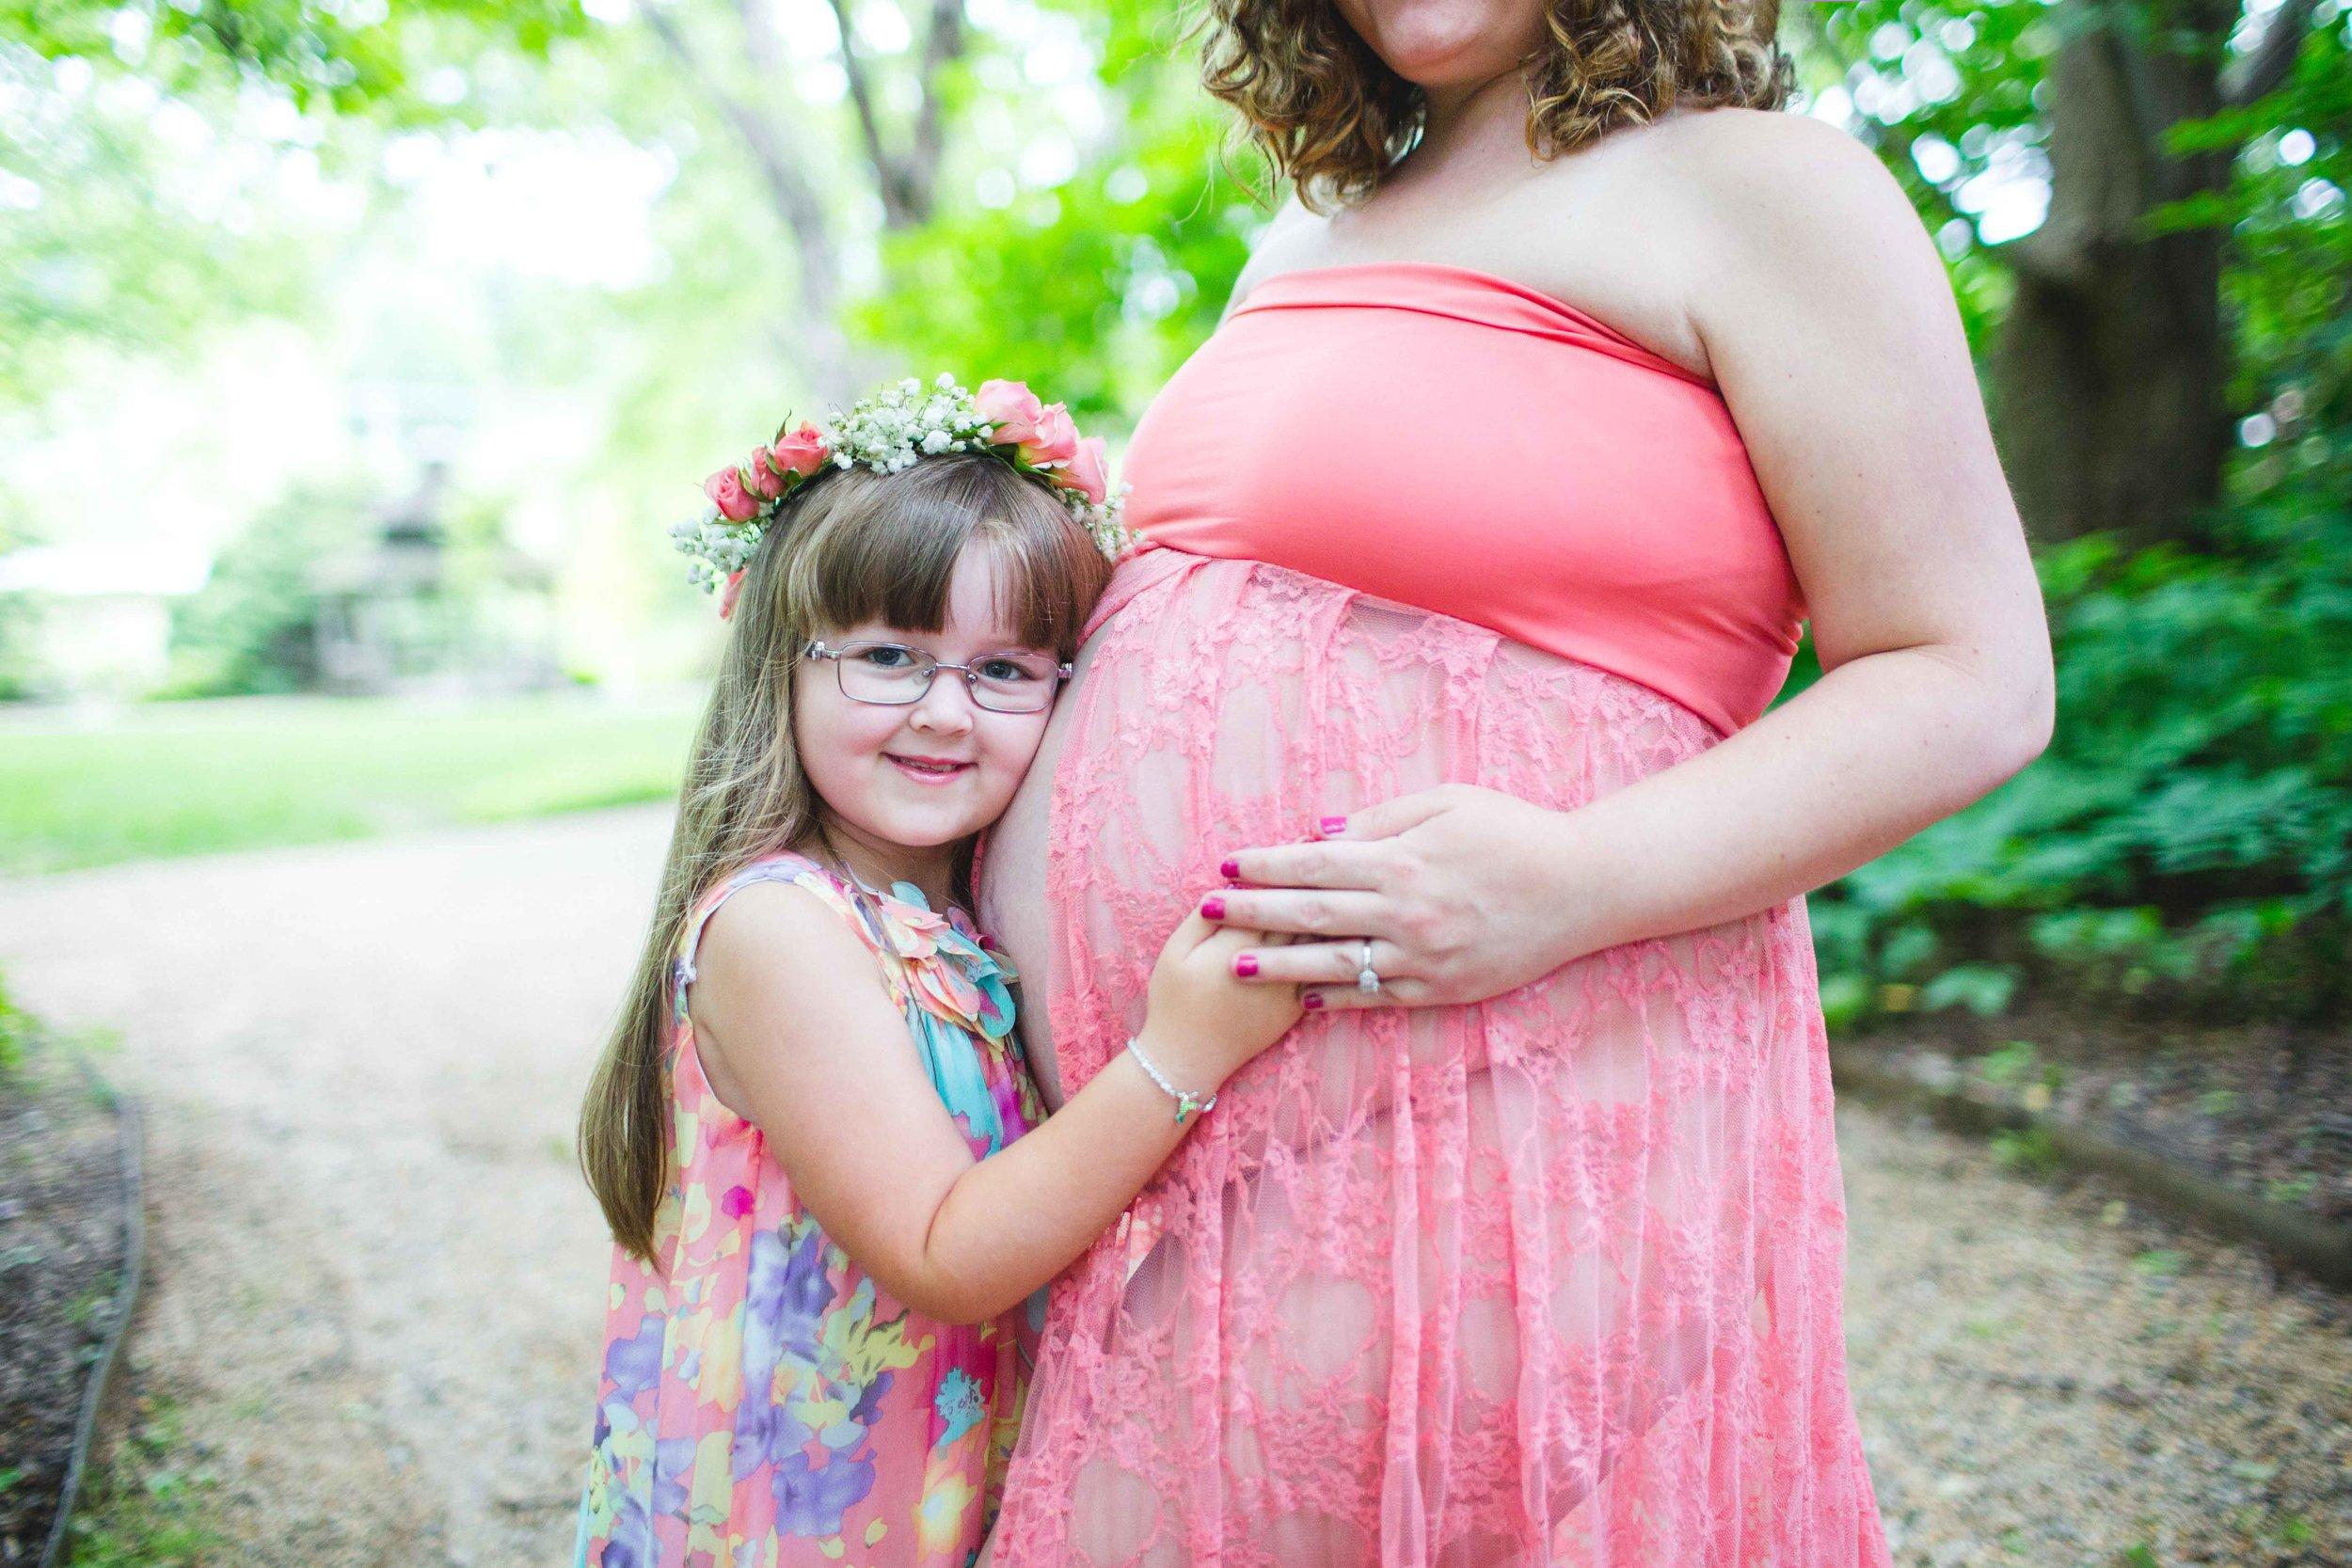 roanoke-maternity-photographer-4.jpg